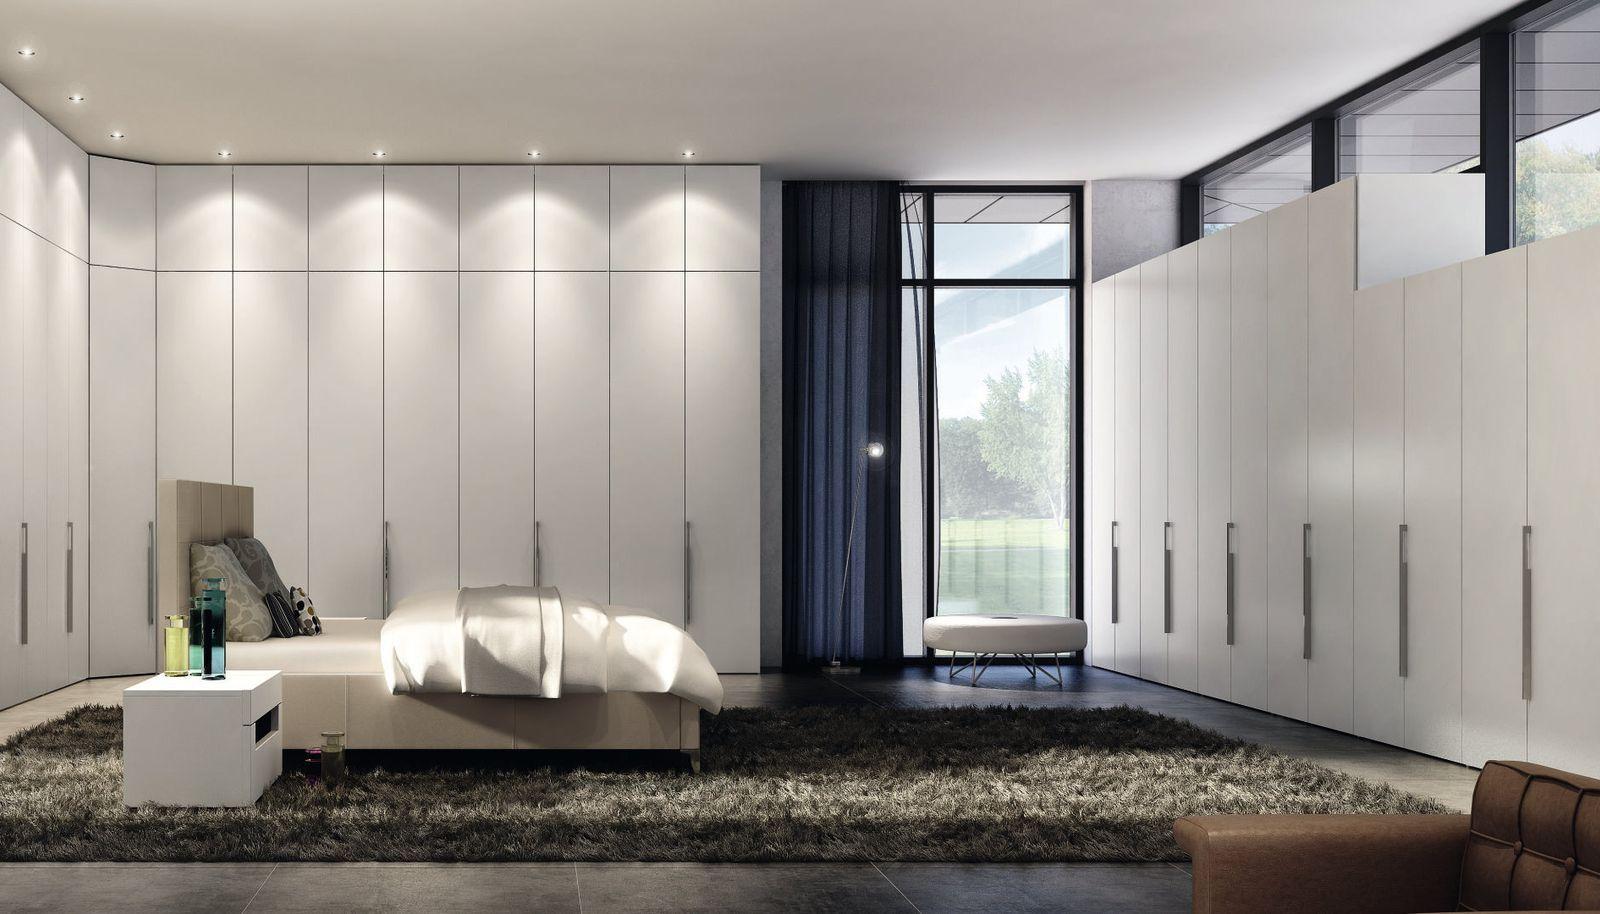 Schlafzimmerschrank hülsta  Hülsta slaapkamer | Droomslaapkamer | Pinterest